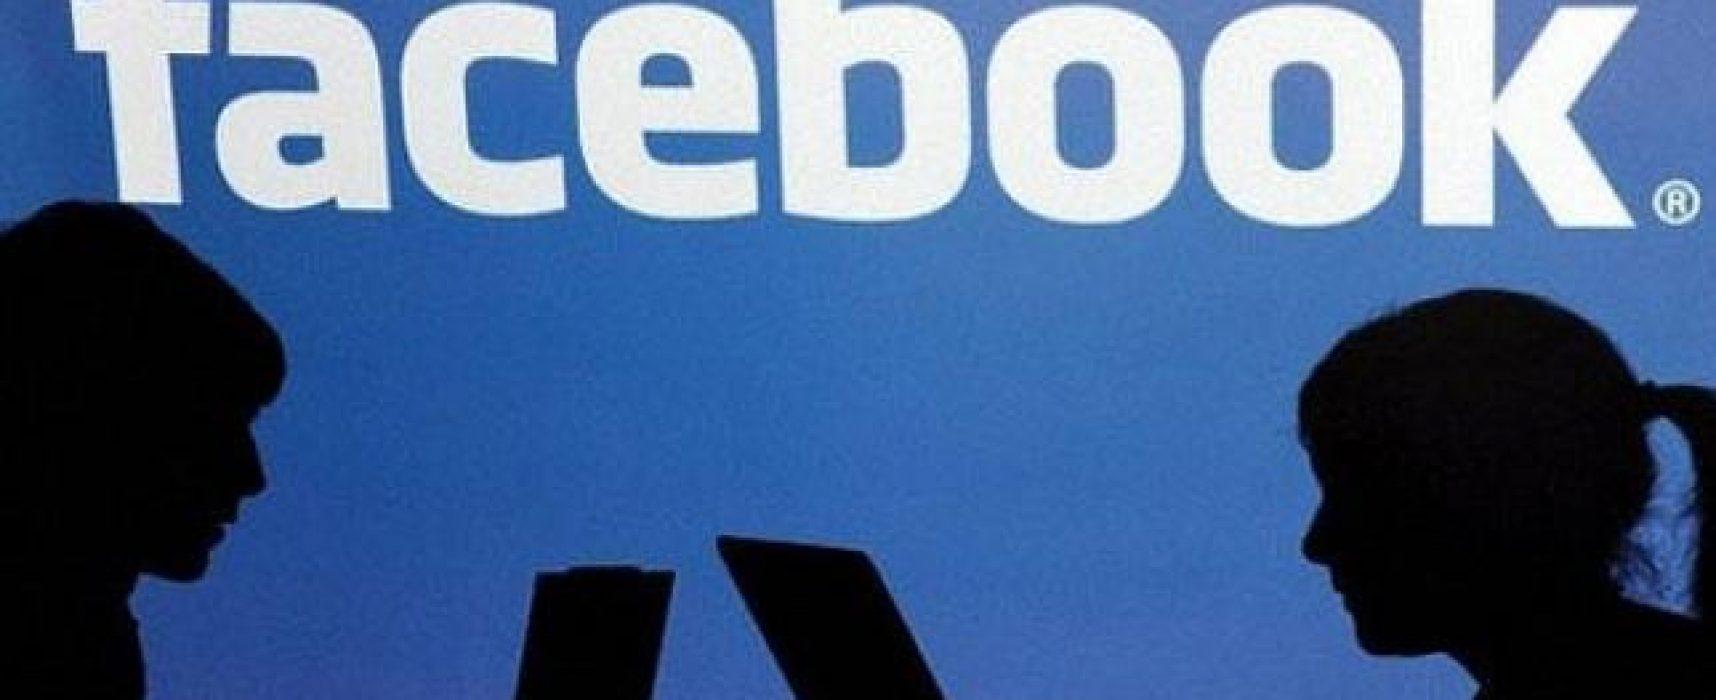 Facebook comenzó a detectar desinformación en fotos y en videos